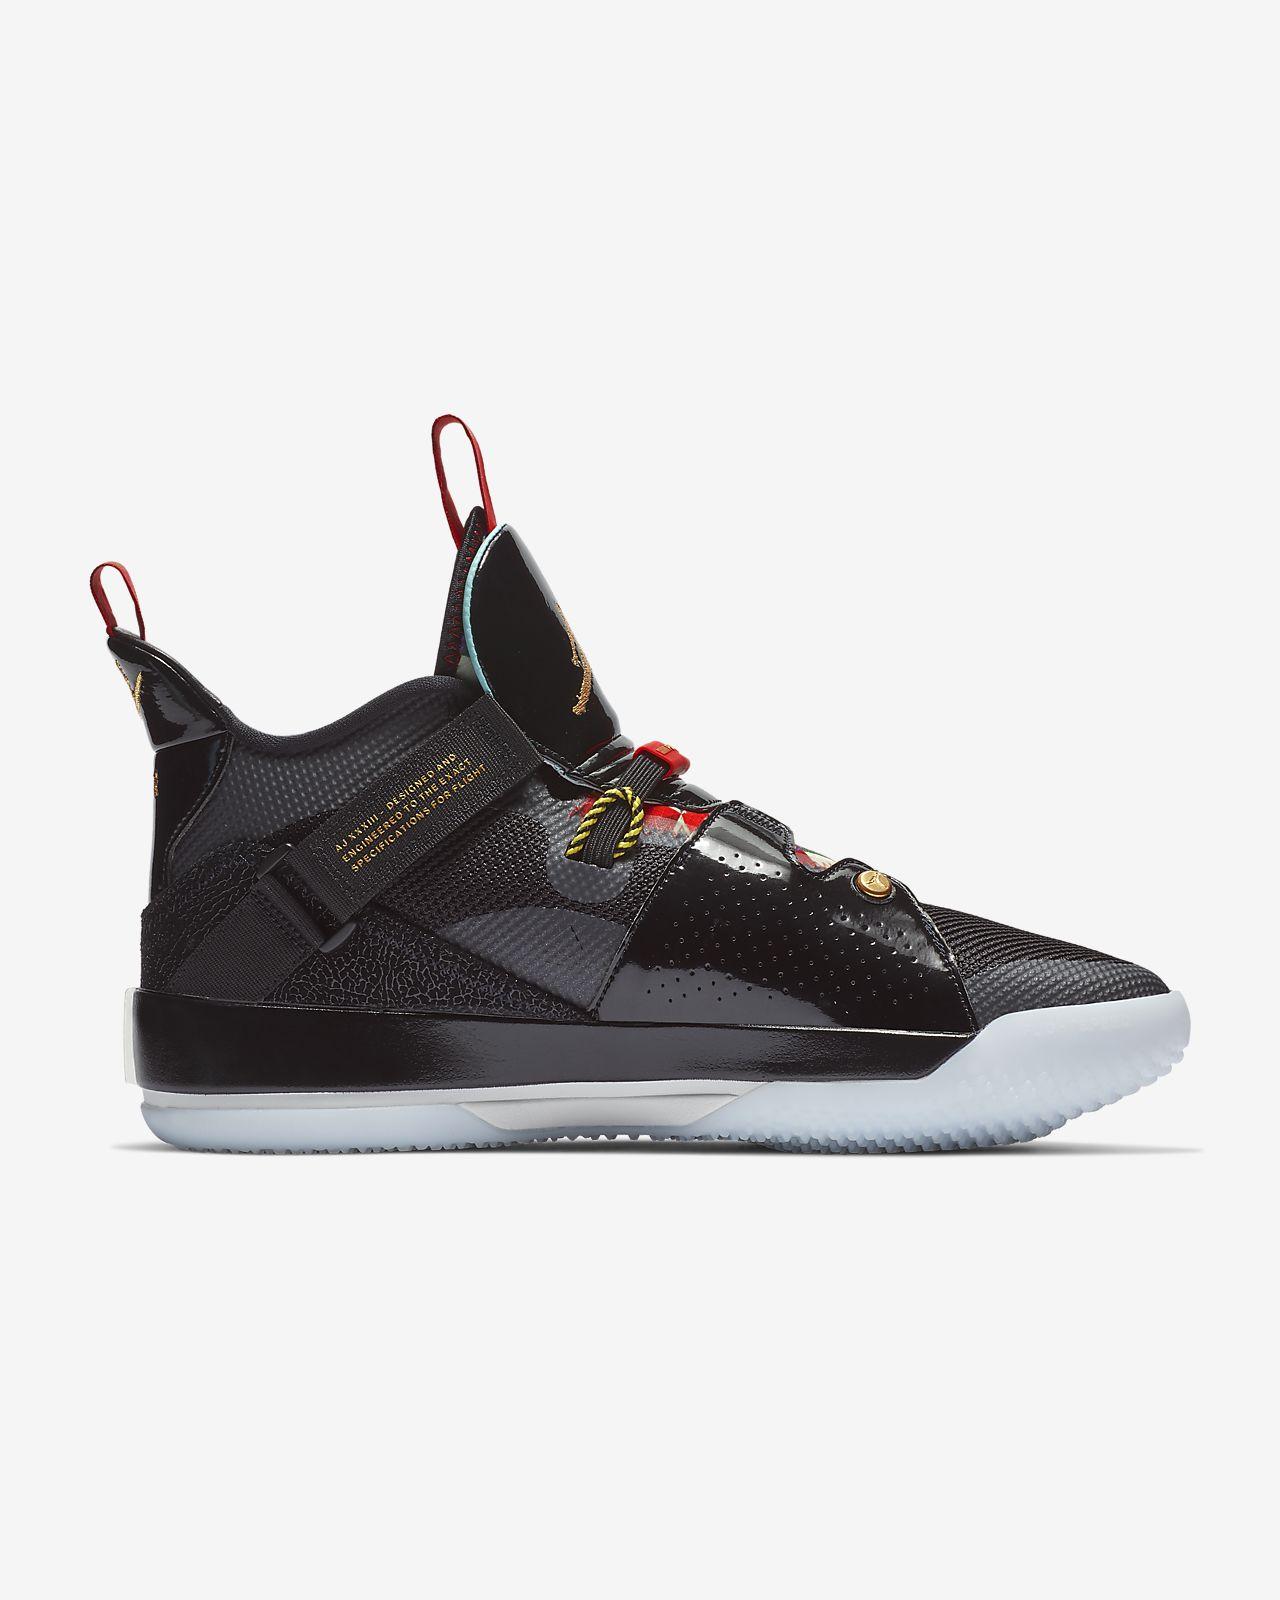 Jordan Air Zapatillas Xxxiii De Baloncesto 43Rj5ALq